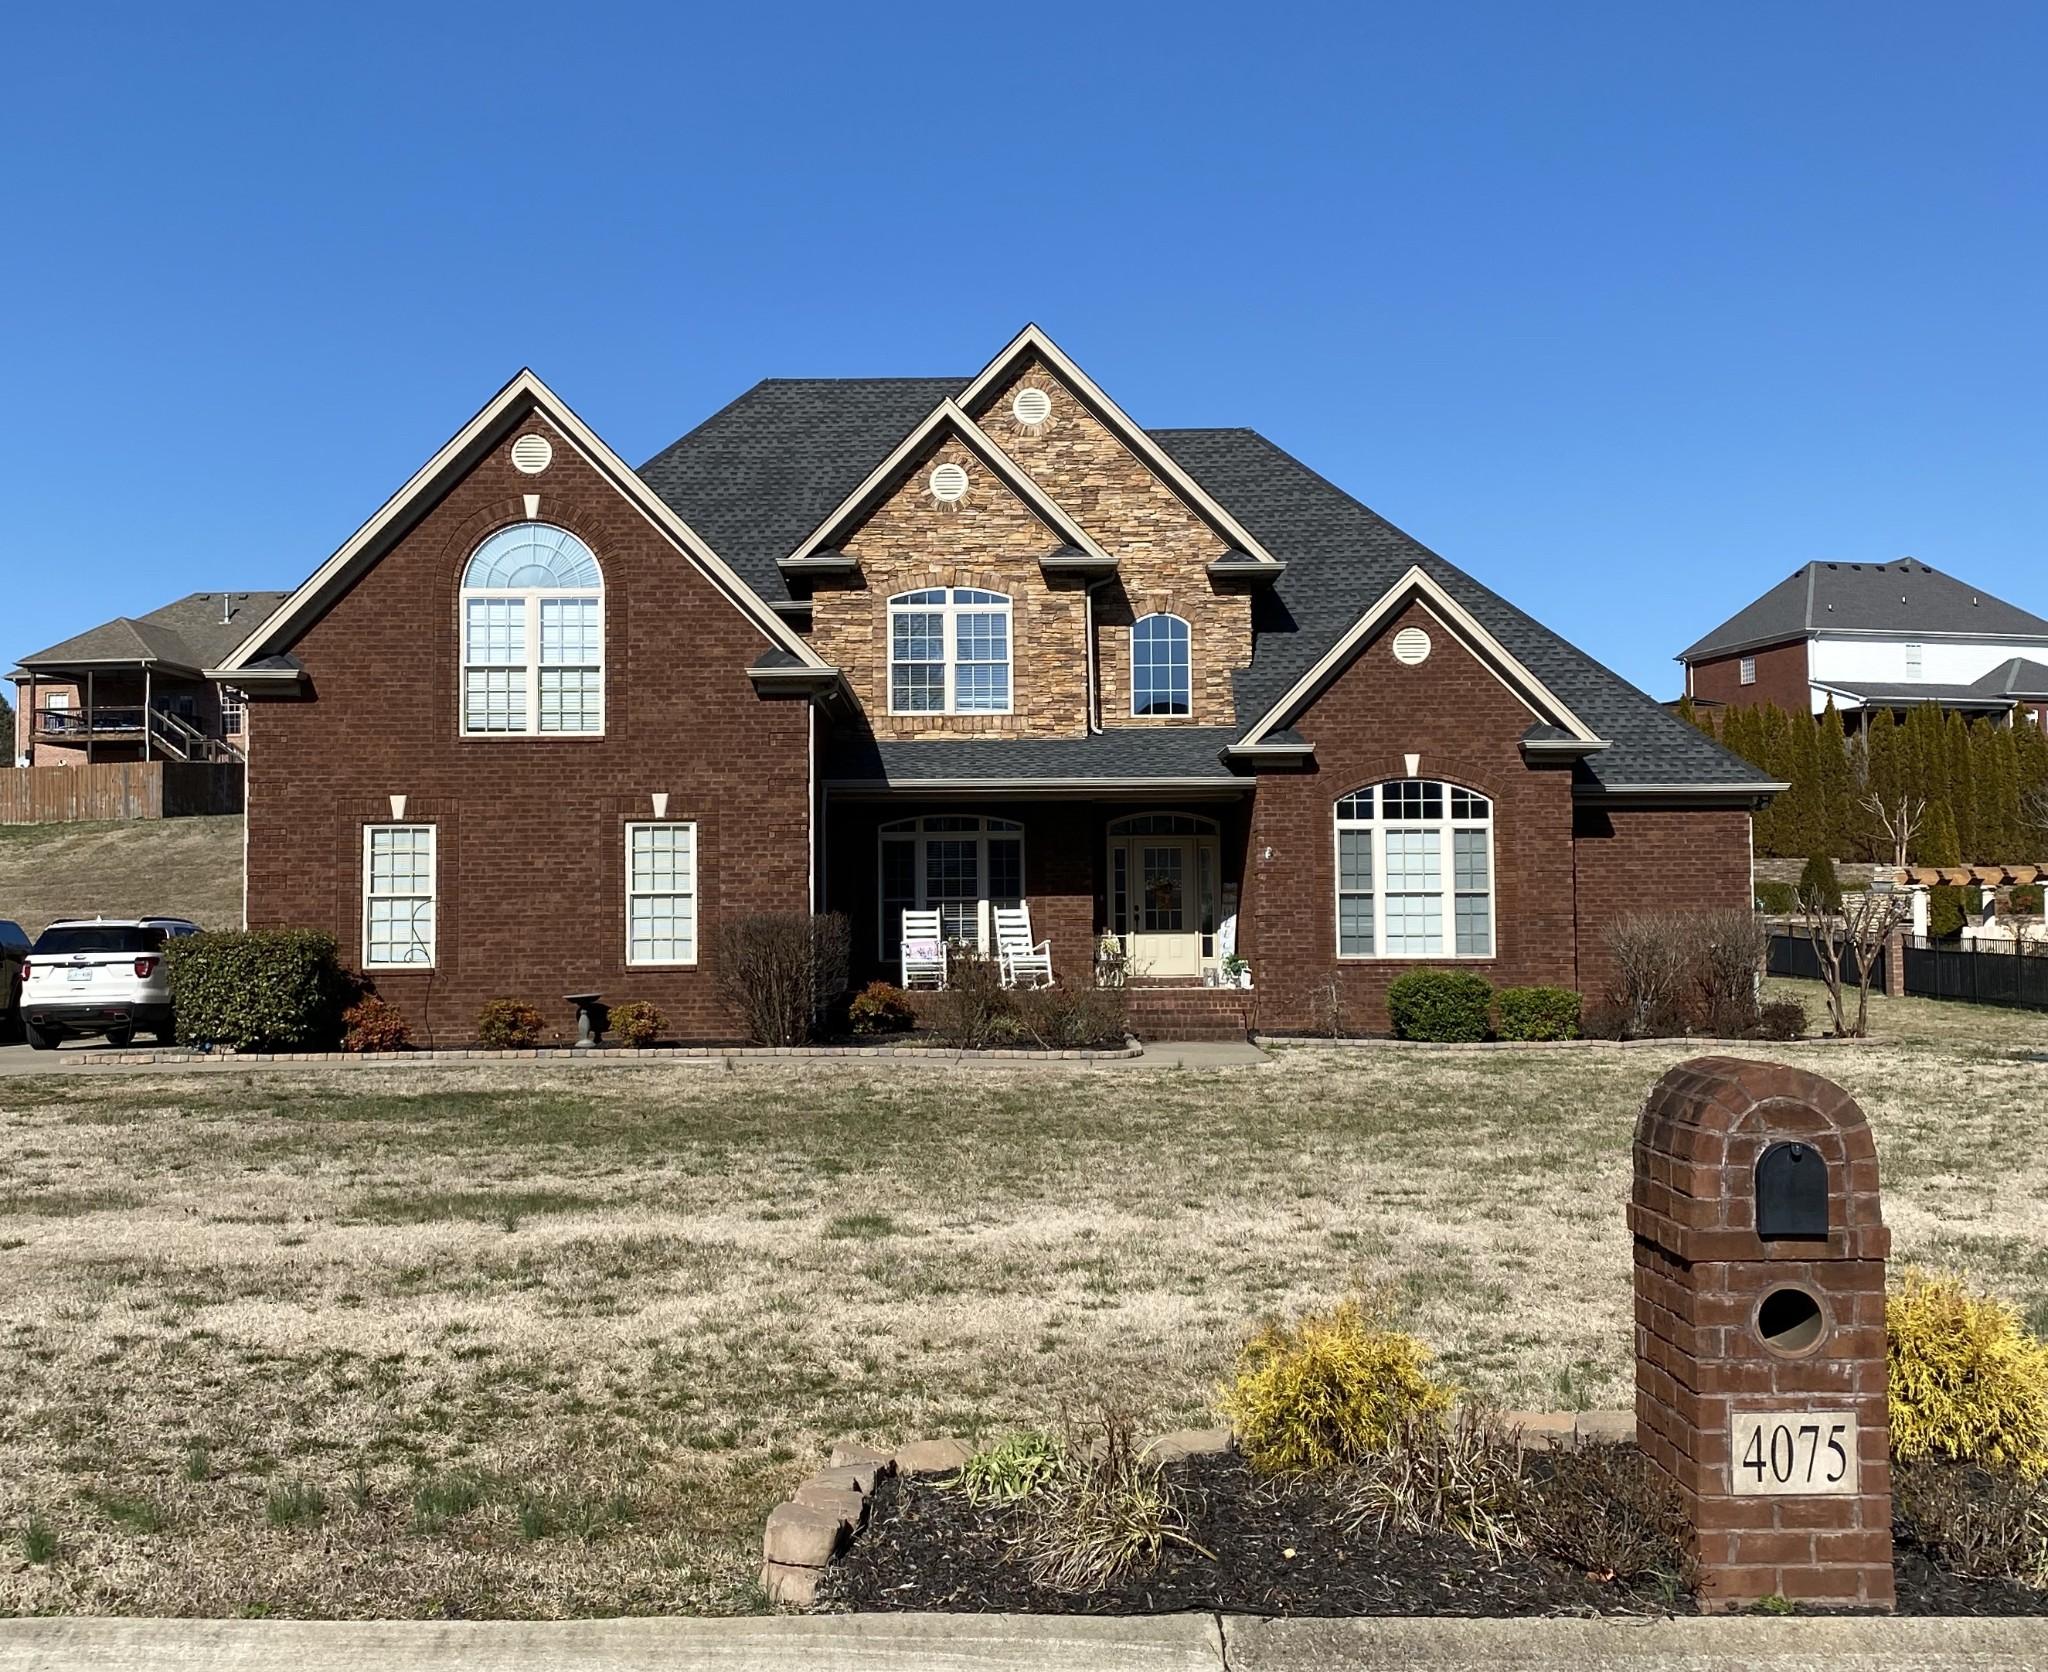 4075 Oak Pointe Dr, Pleasant View, TN 37146 - Pleasant View, TN real estate listing